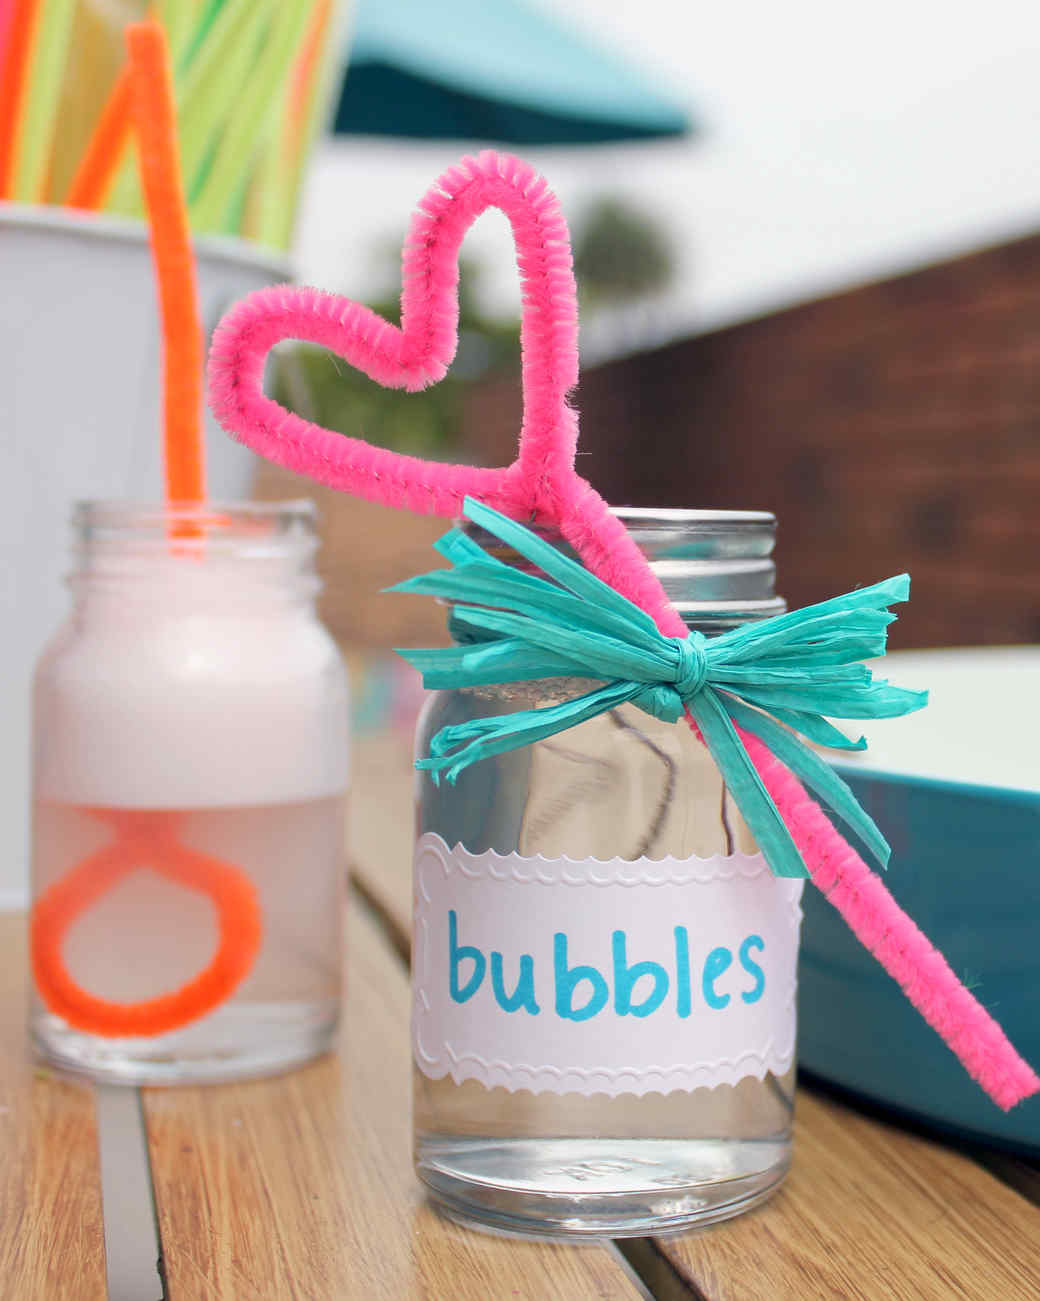 bubble-wand-the-honest-company-001-0715.jpg